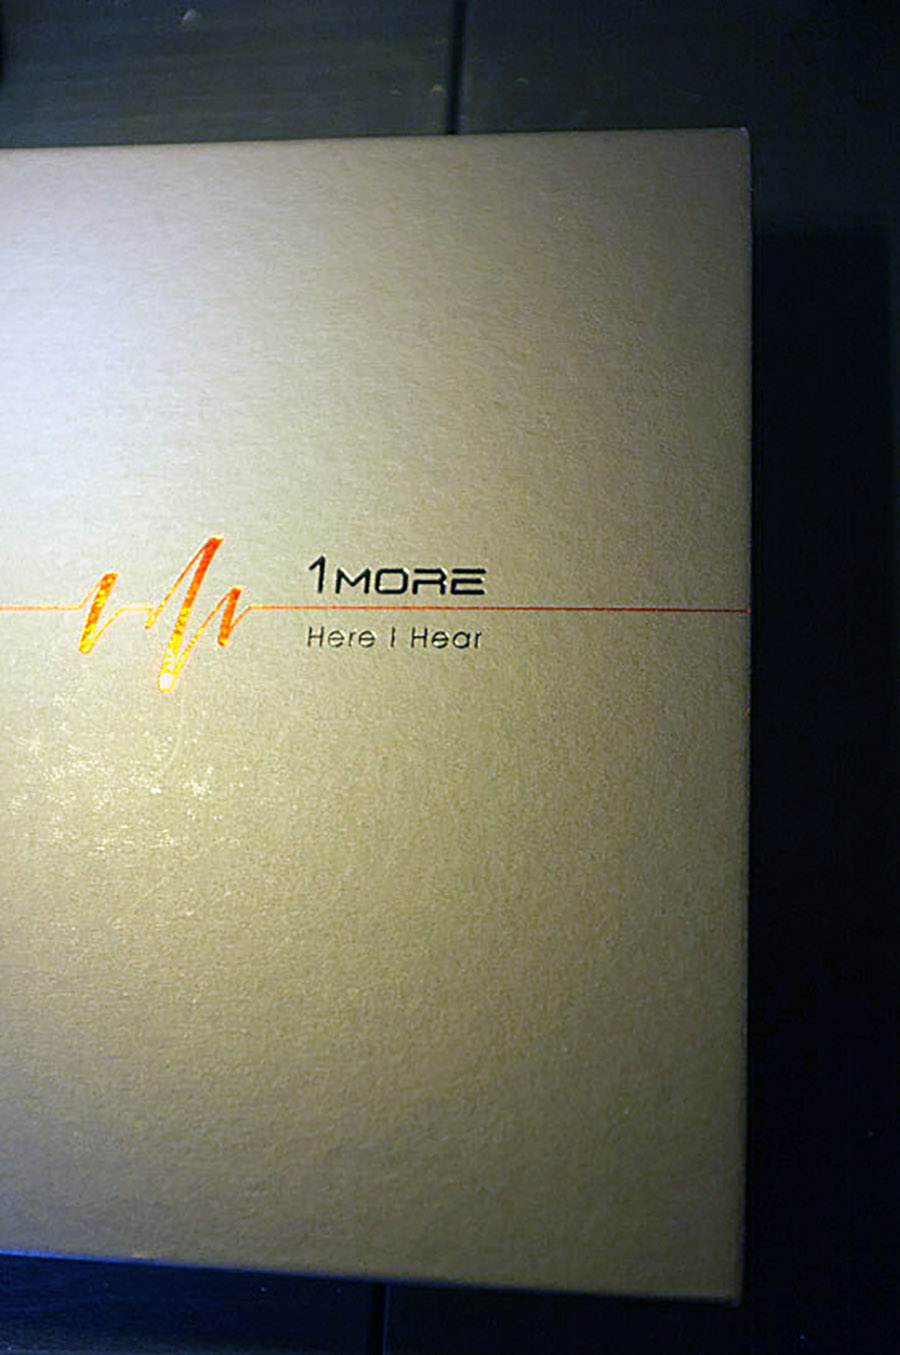 1more3